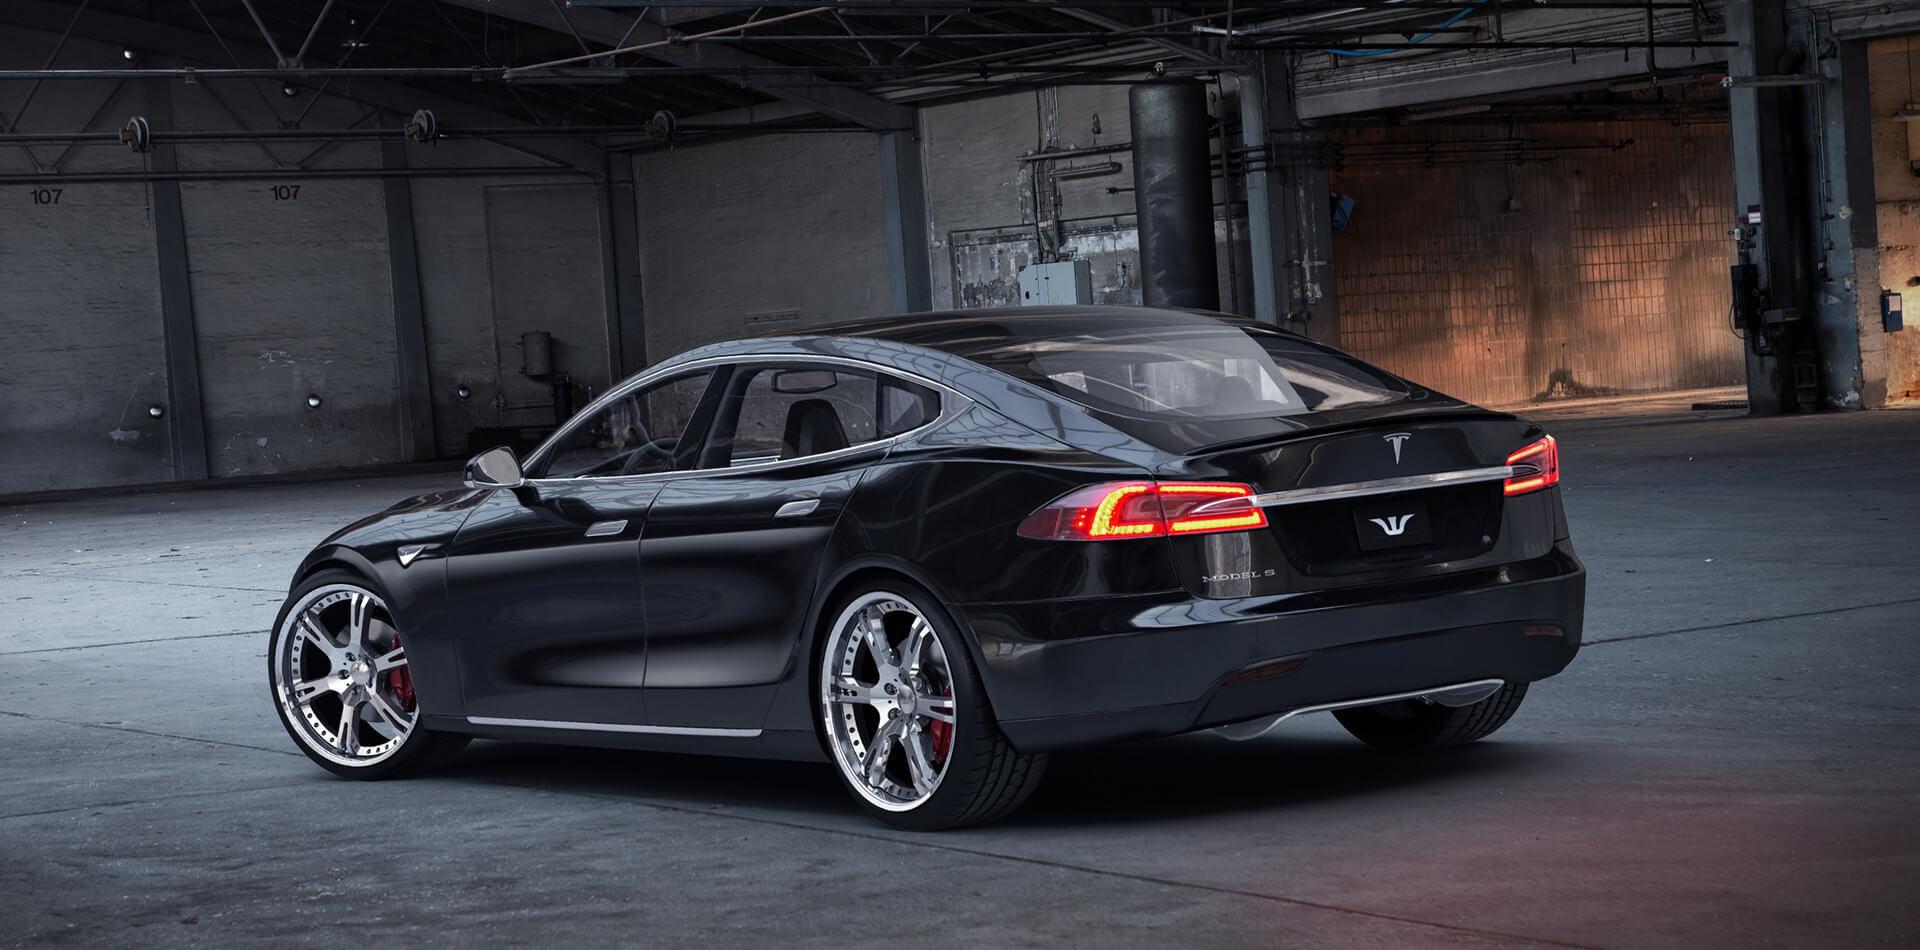 Tesla S Tuningkomponenten by Wheelsandmore – 100% handgefertigt in Deutschland